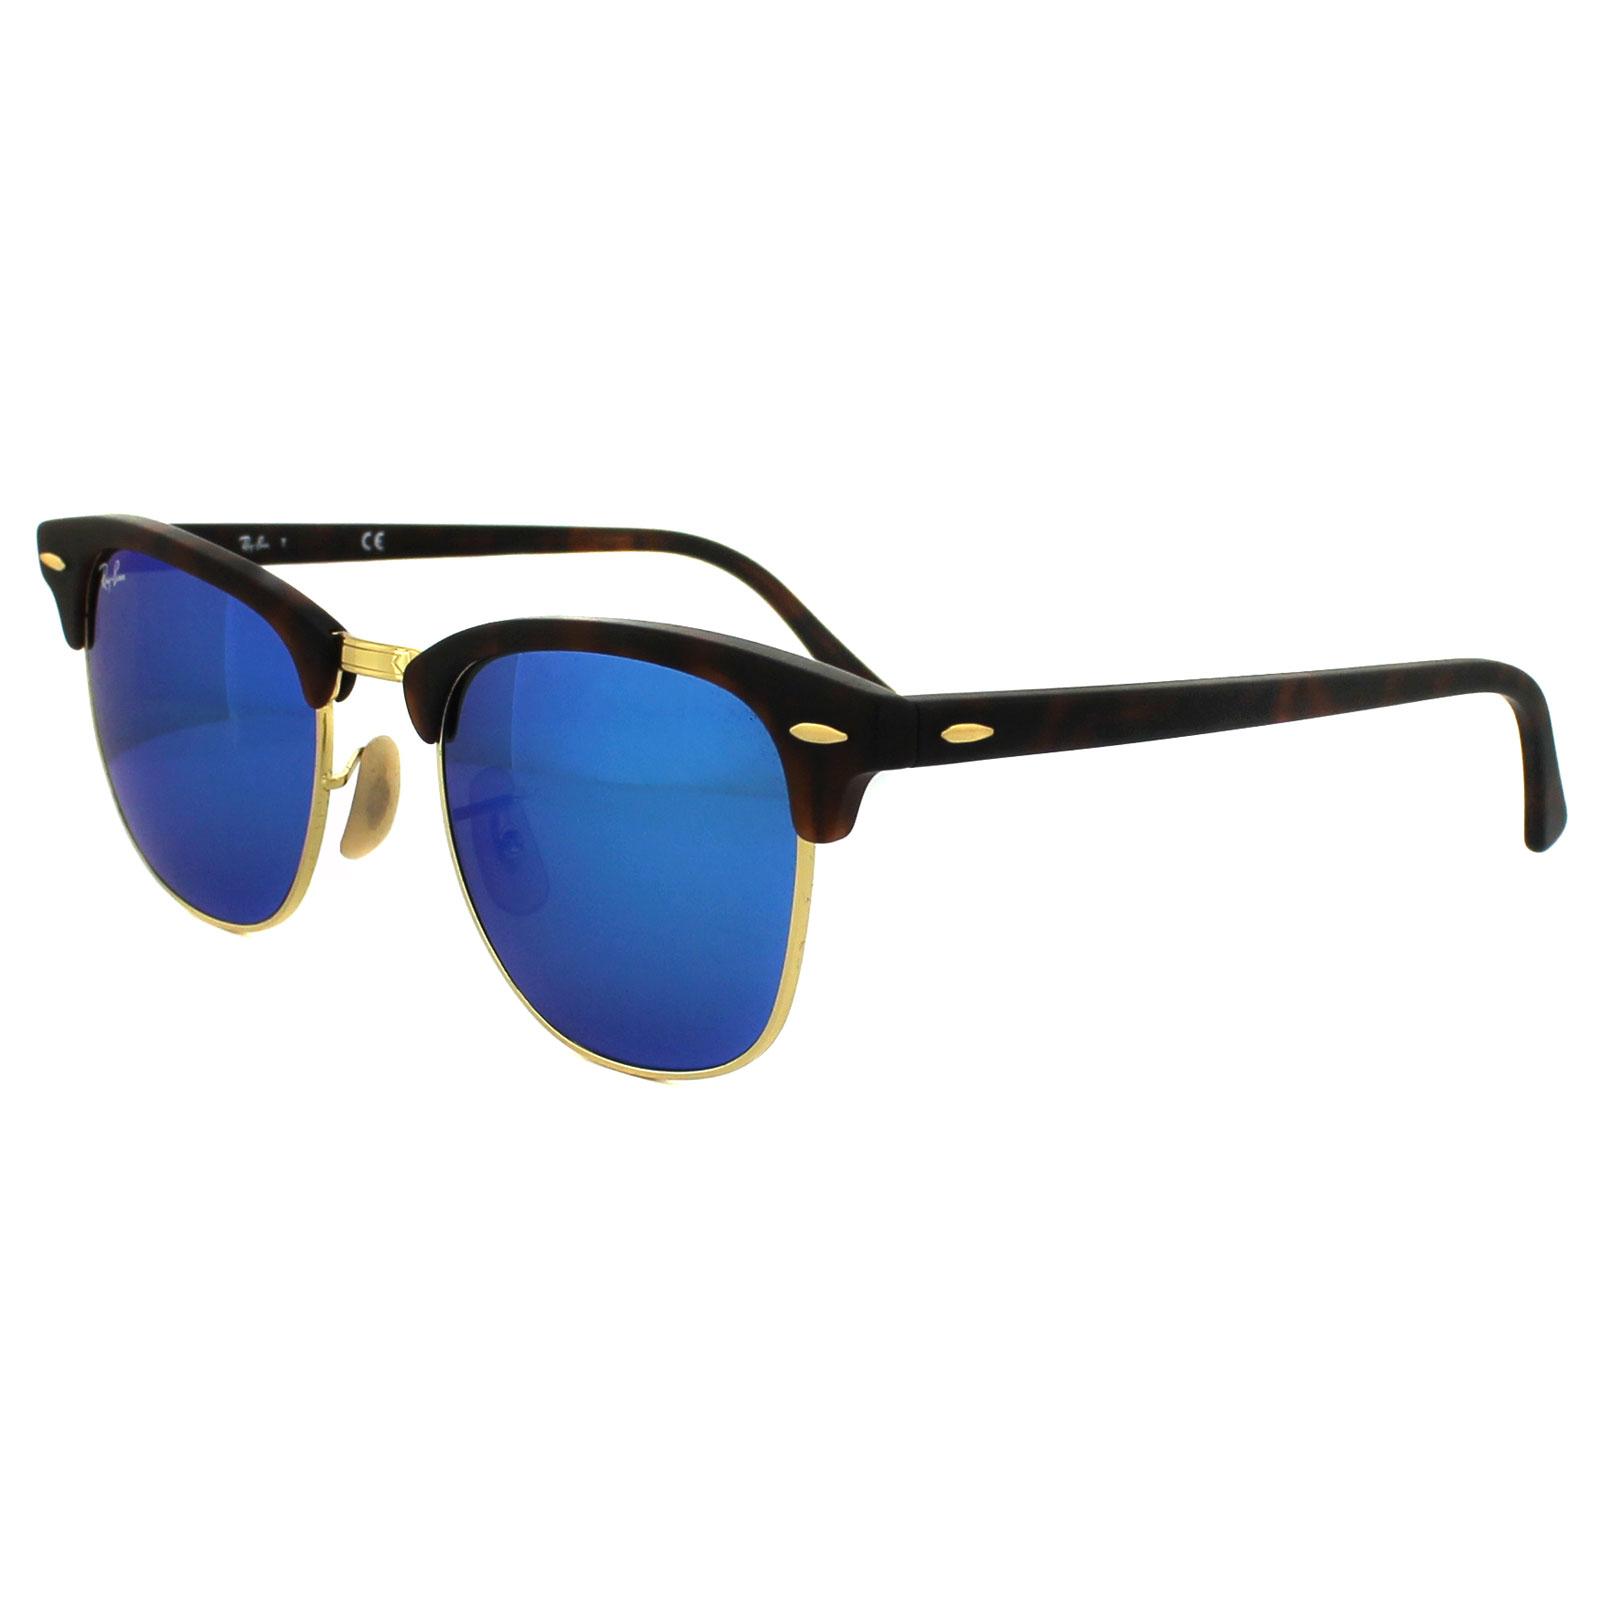 9910b886b2 Details about Ray-Ban Sunglasses Clubmaster 3016 114517 Matt Tortoise Blue  Flash Mirror Large